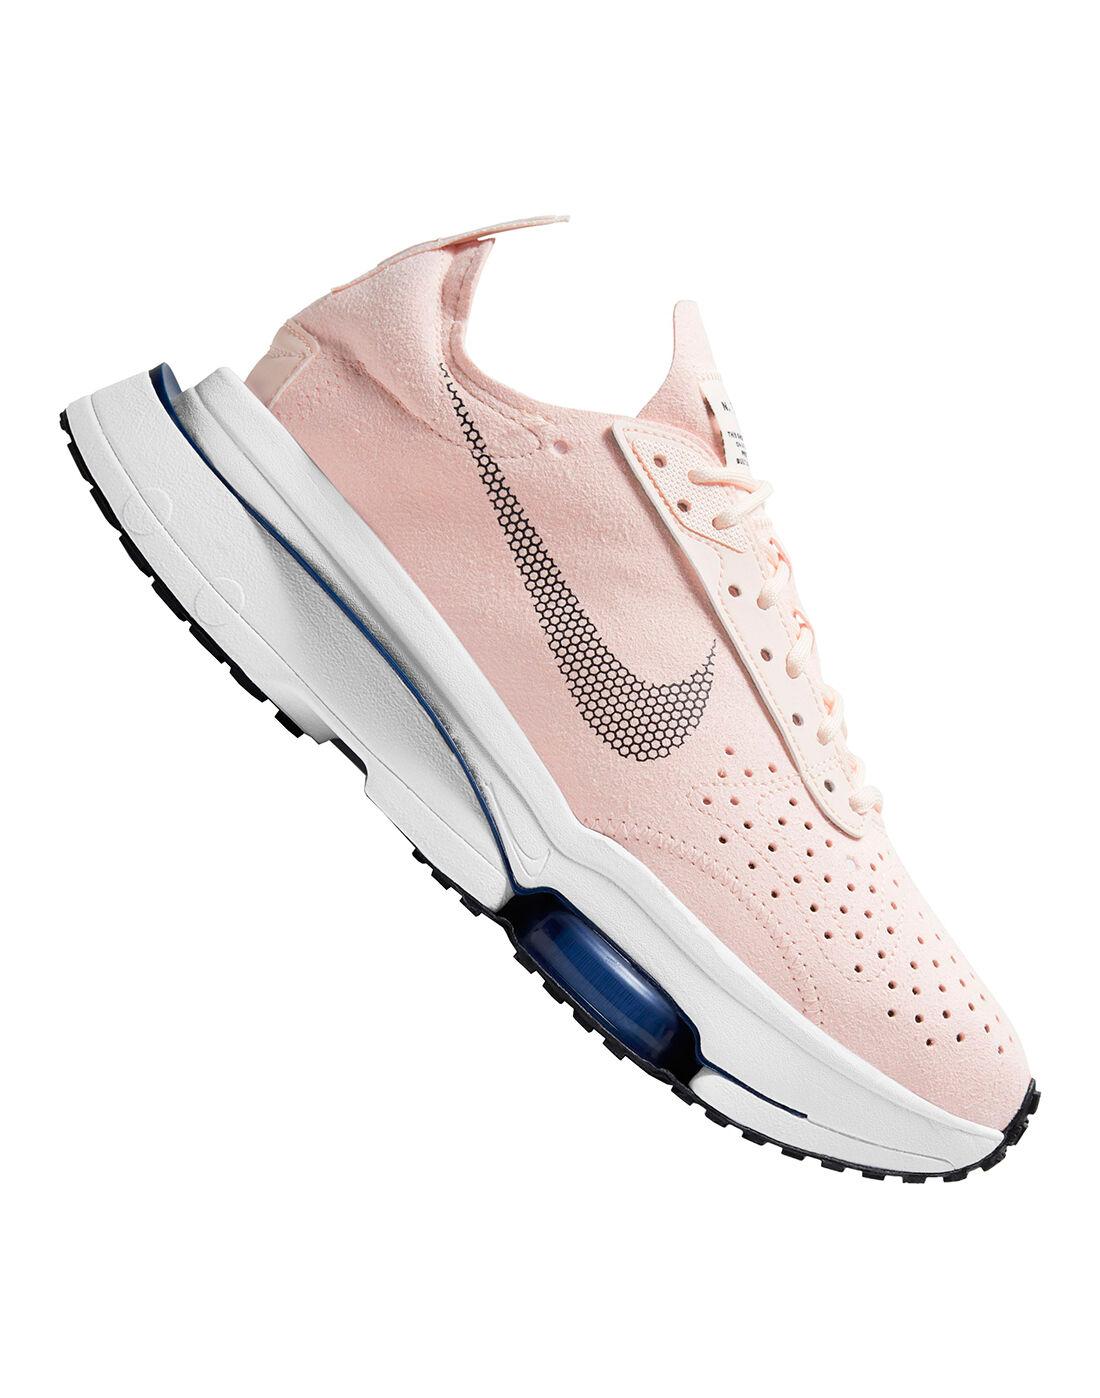 Nike huarache nike shoes for sale | Womens Air Zoom Type